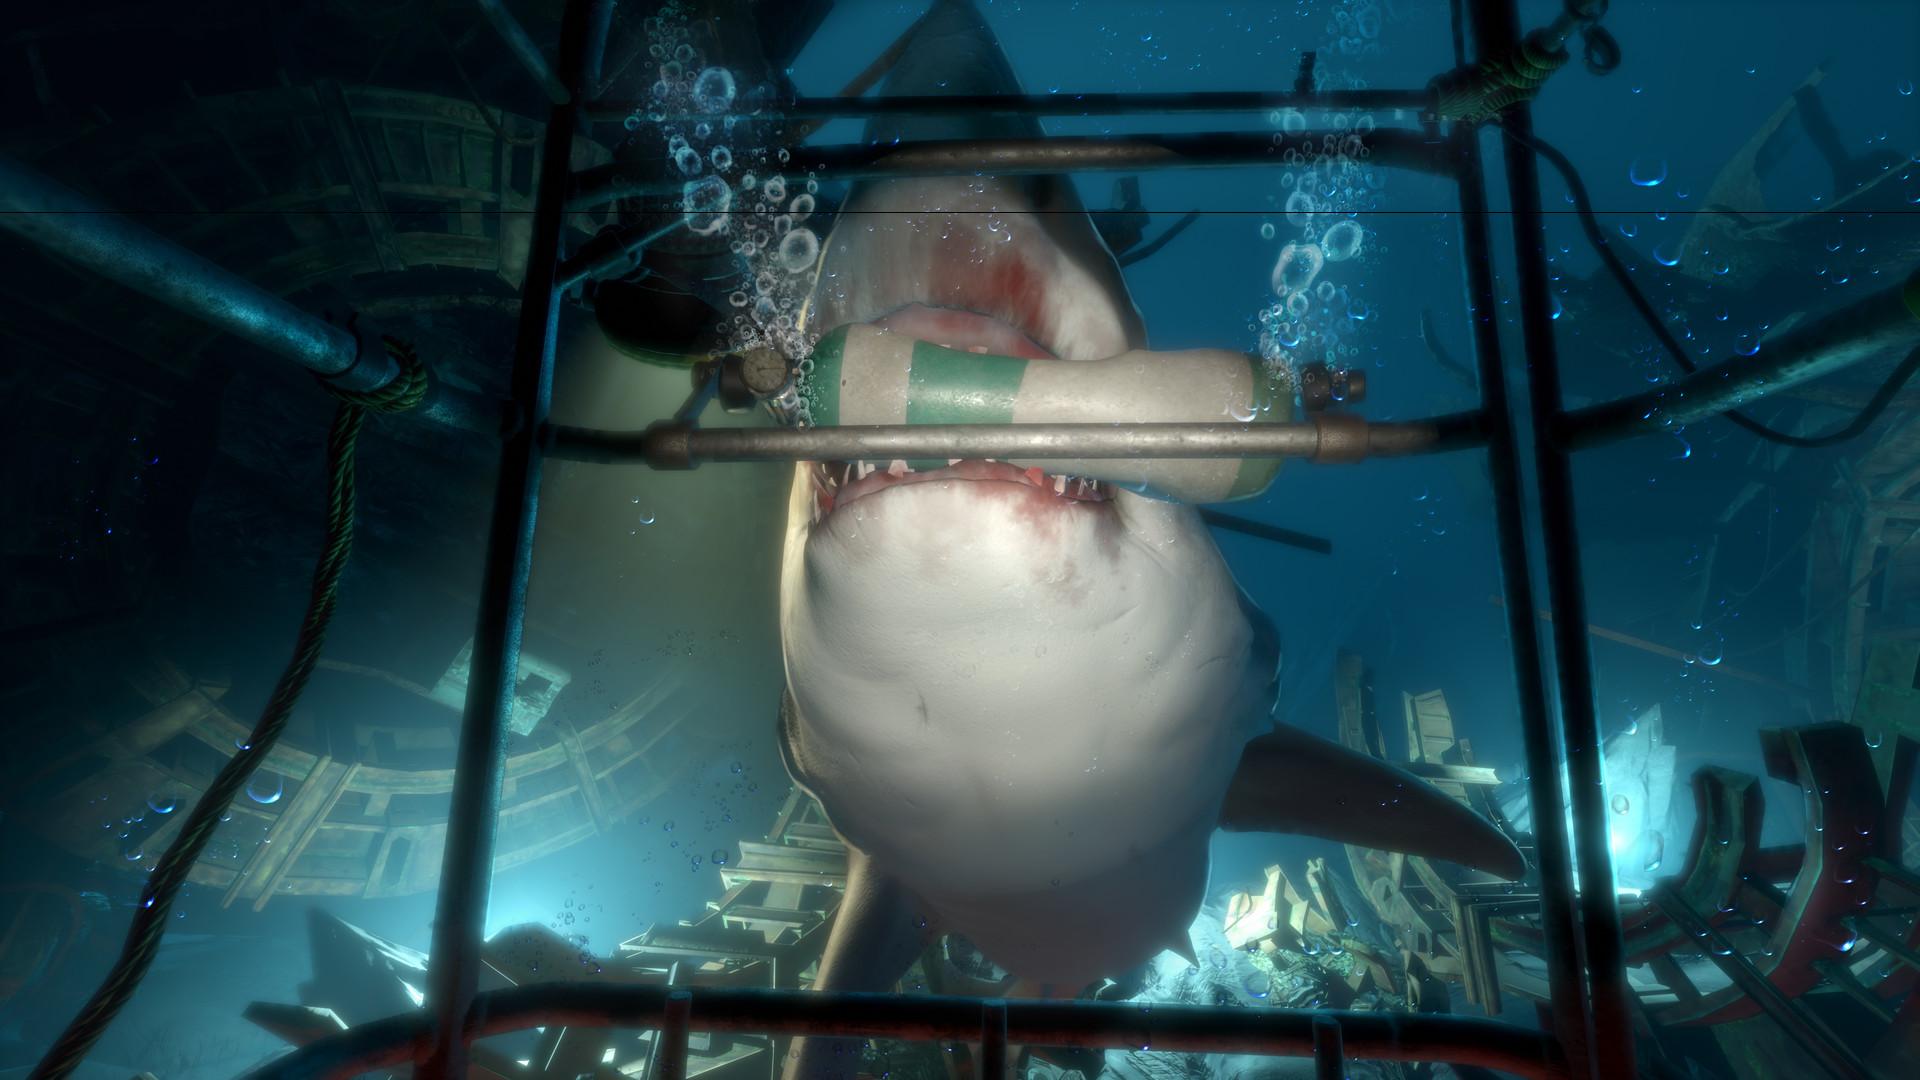 Robert thornely thedeep shark 01 nologo